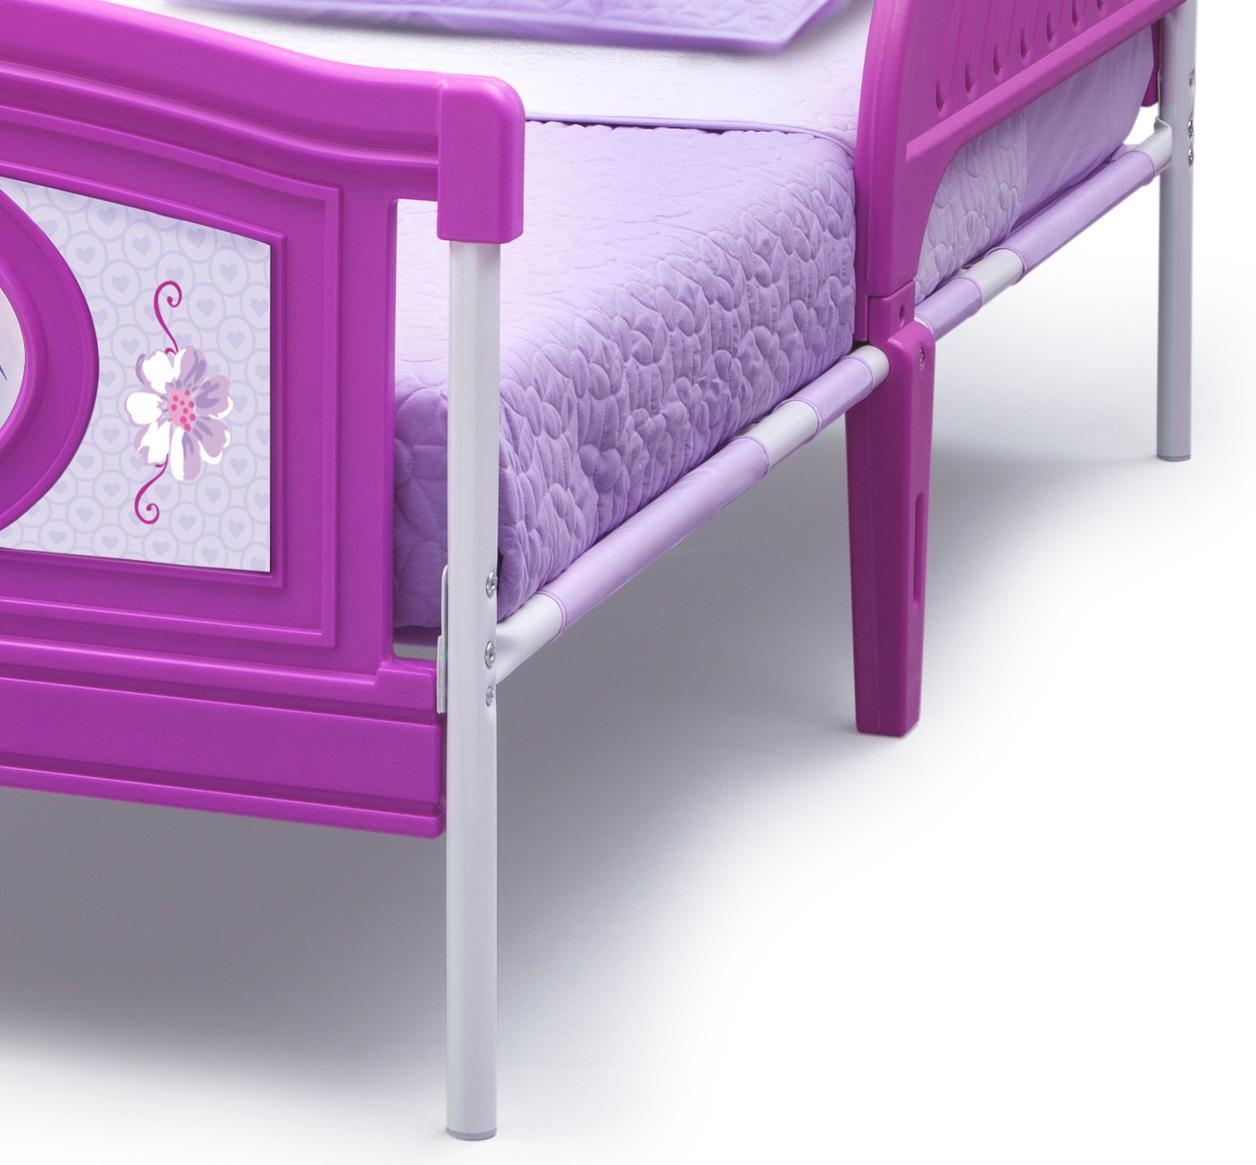 Cheap Bedroom Sets Kids Elsa From Frozen For Girls Toddler: Amazon.com: Delta Children Twin Bed, Disney Frozen: Baby